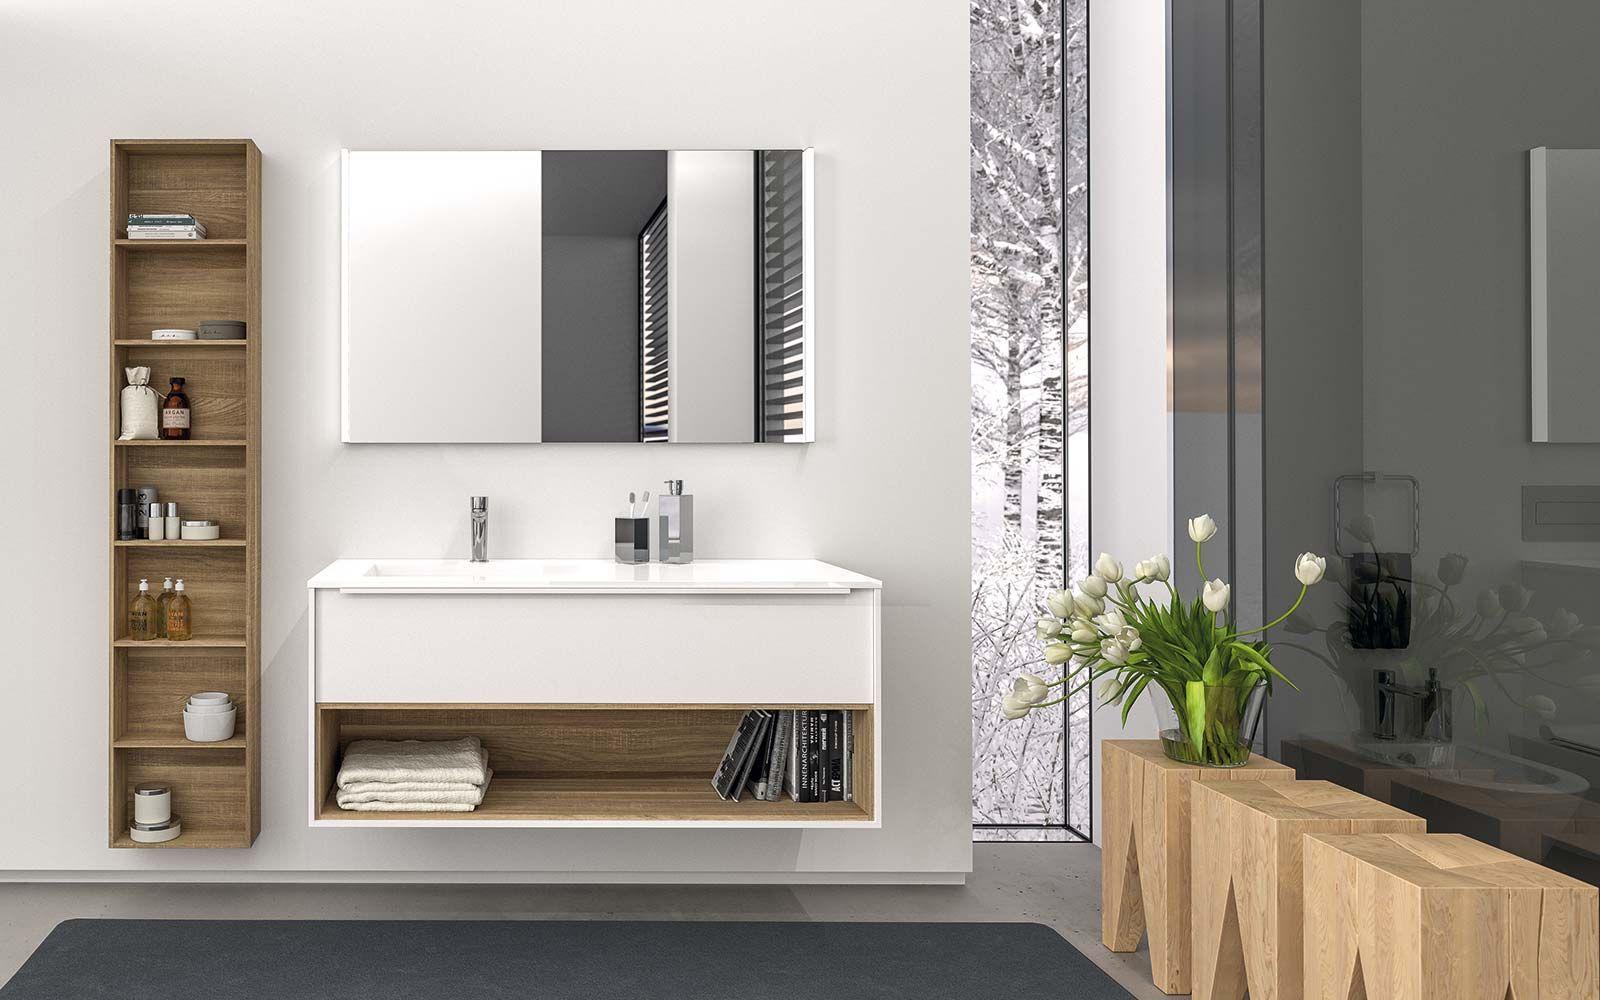 Berloni Bagno bathroom furnishings SPECS Interior Casework